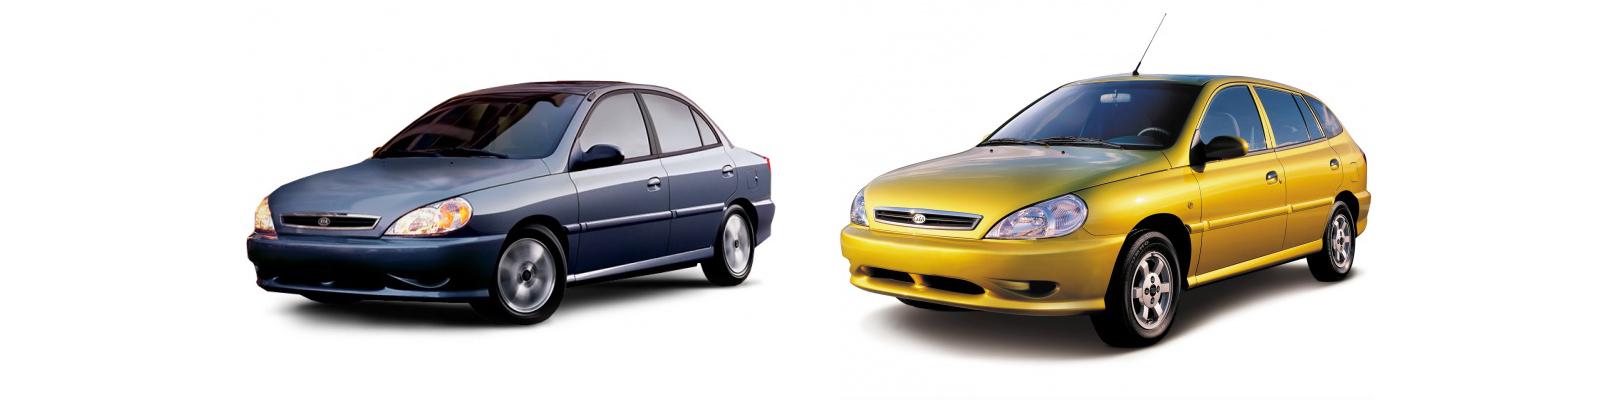 Kia Rio - История. Поколения модели | Форум Kia - Auto.Club